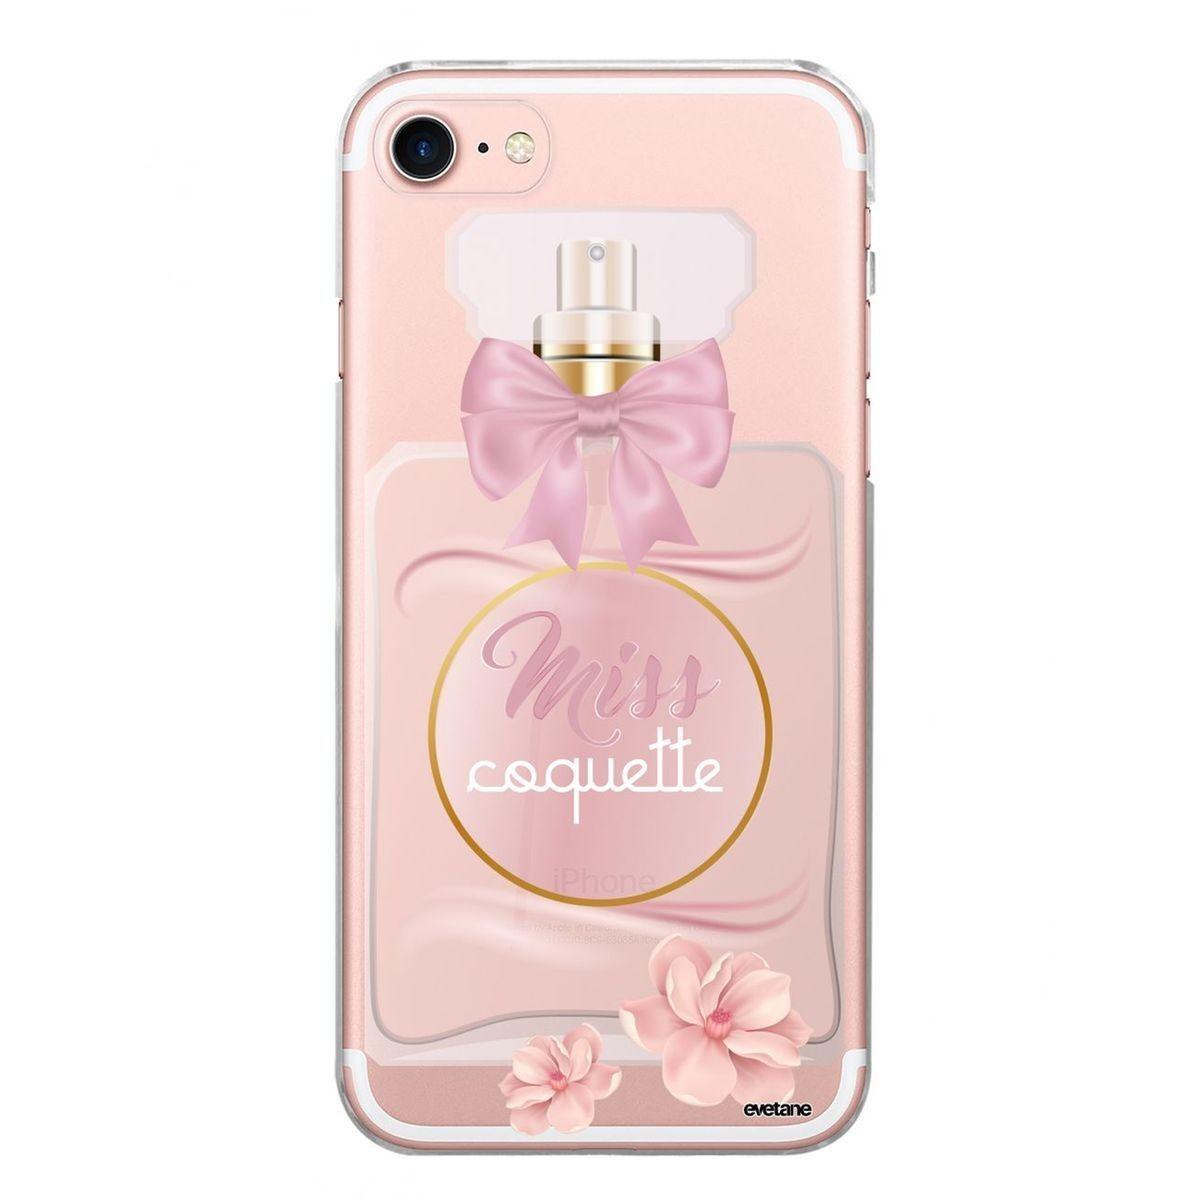 coque iphone 8 miss